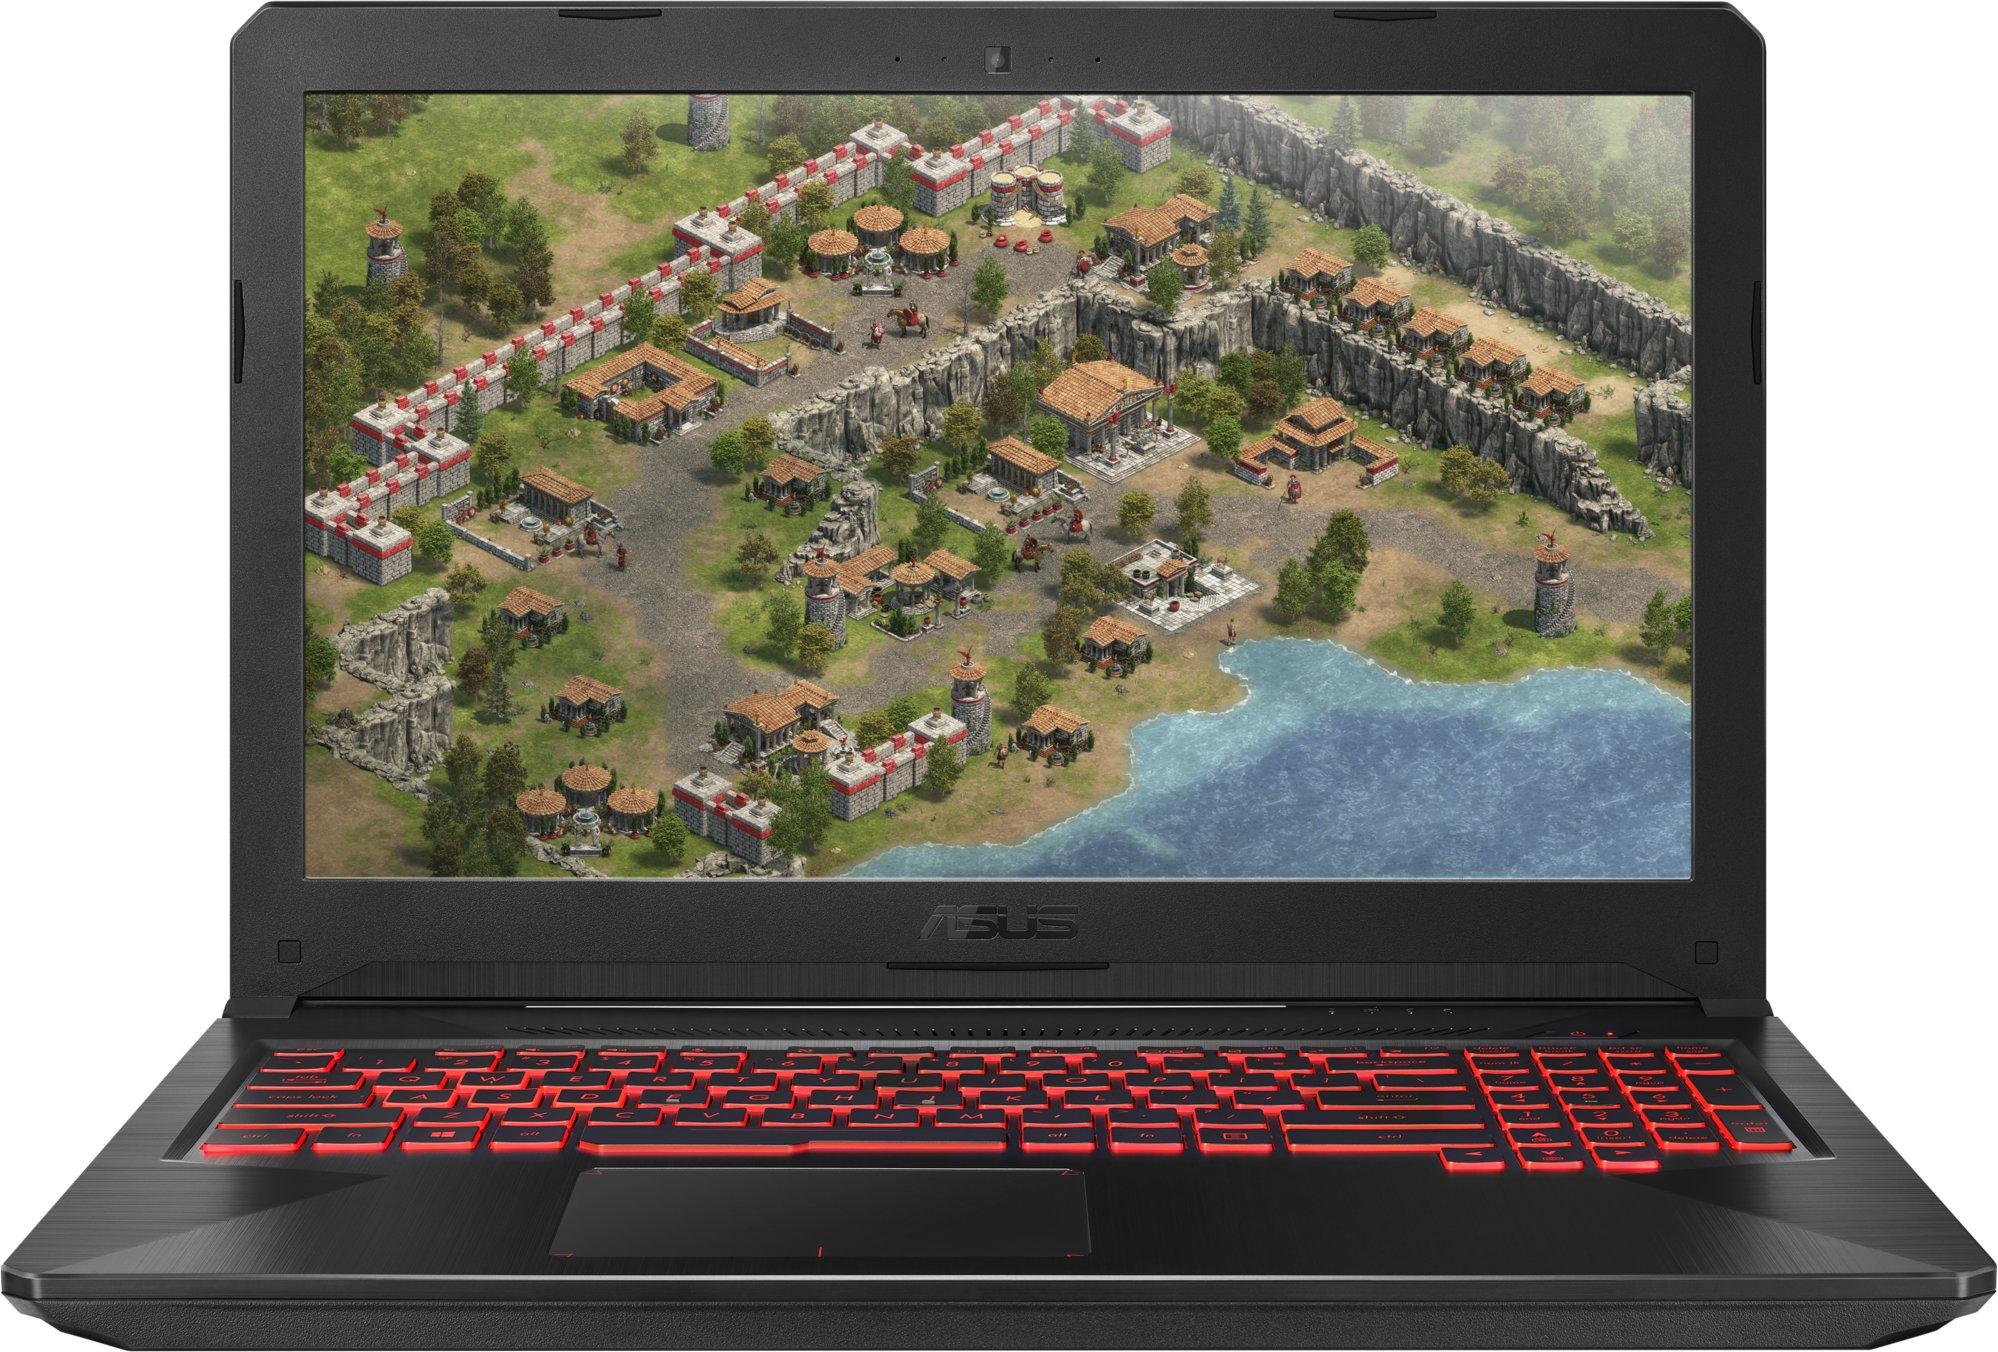 Asus TUF Gaming FX504GE-E4526T